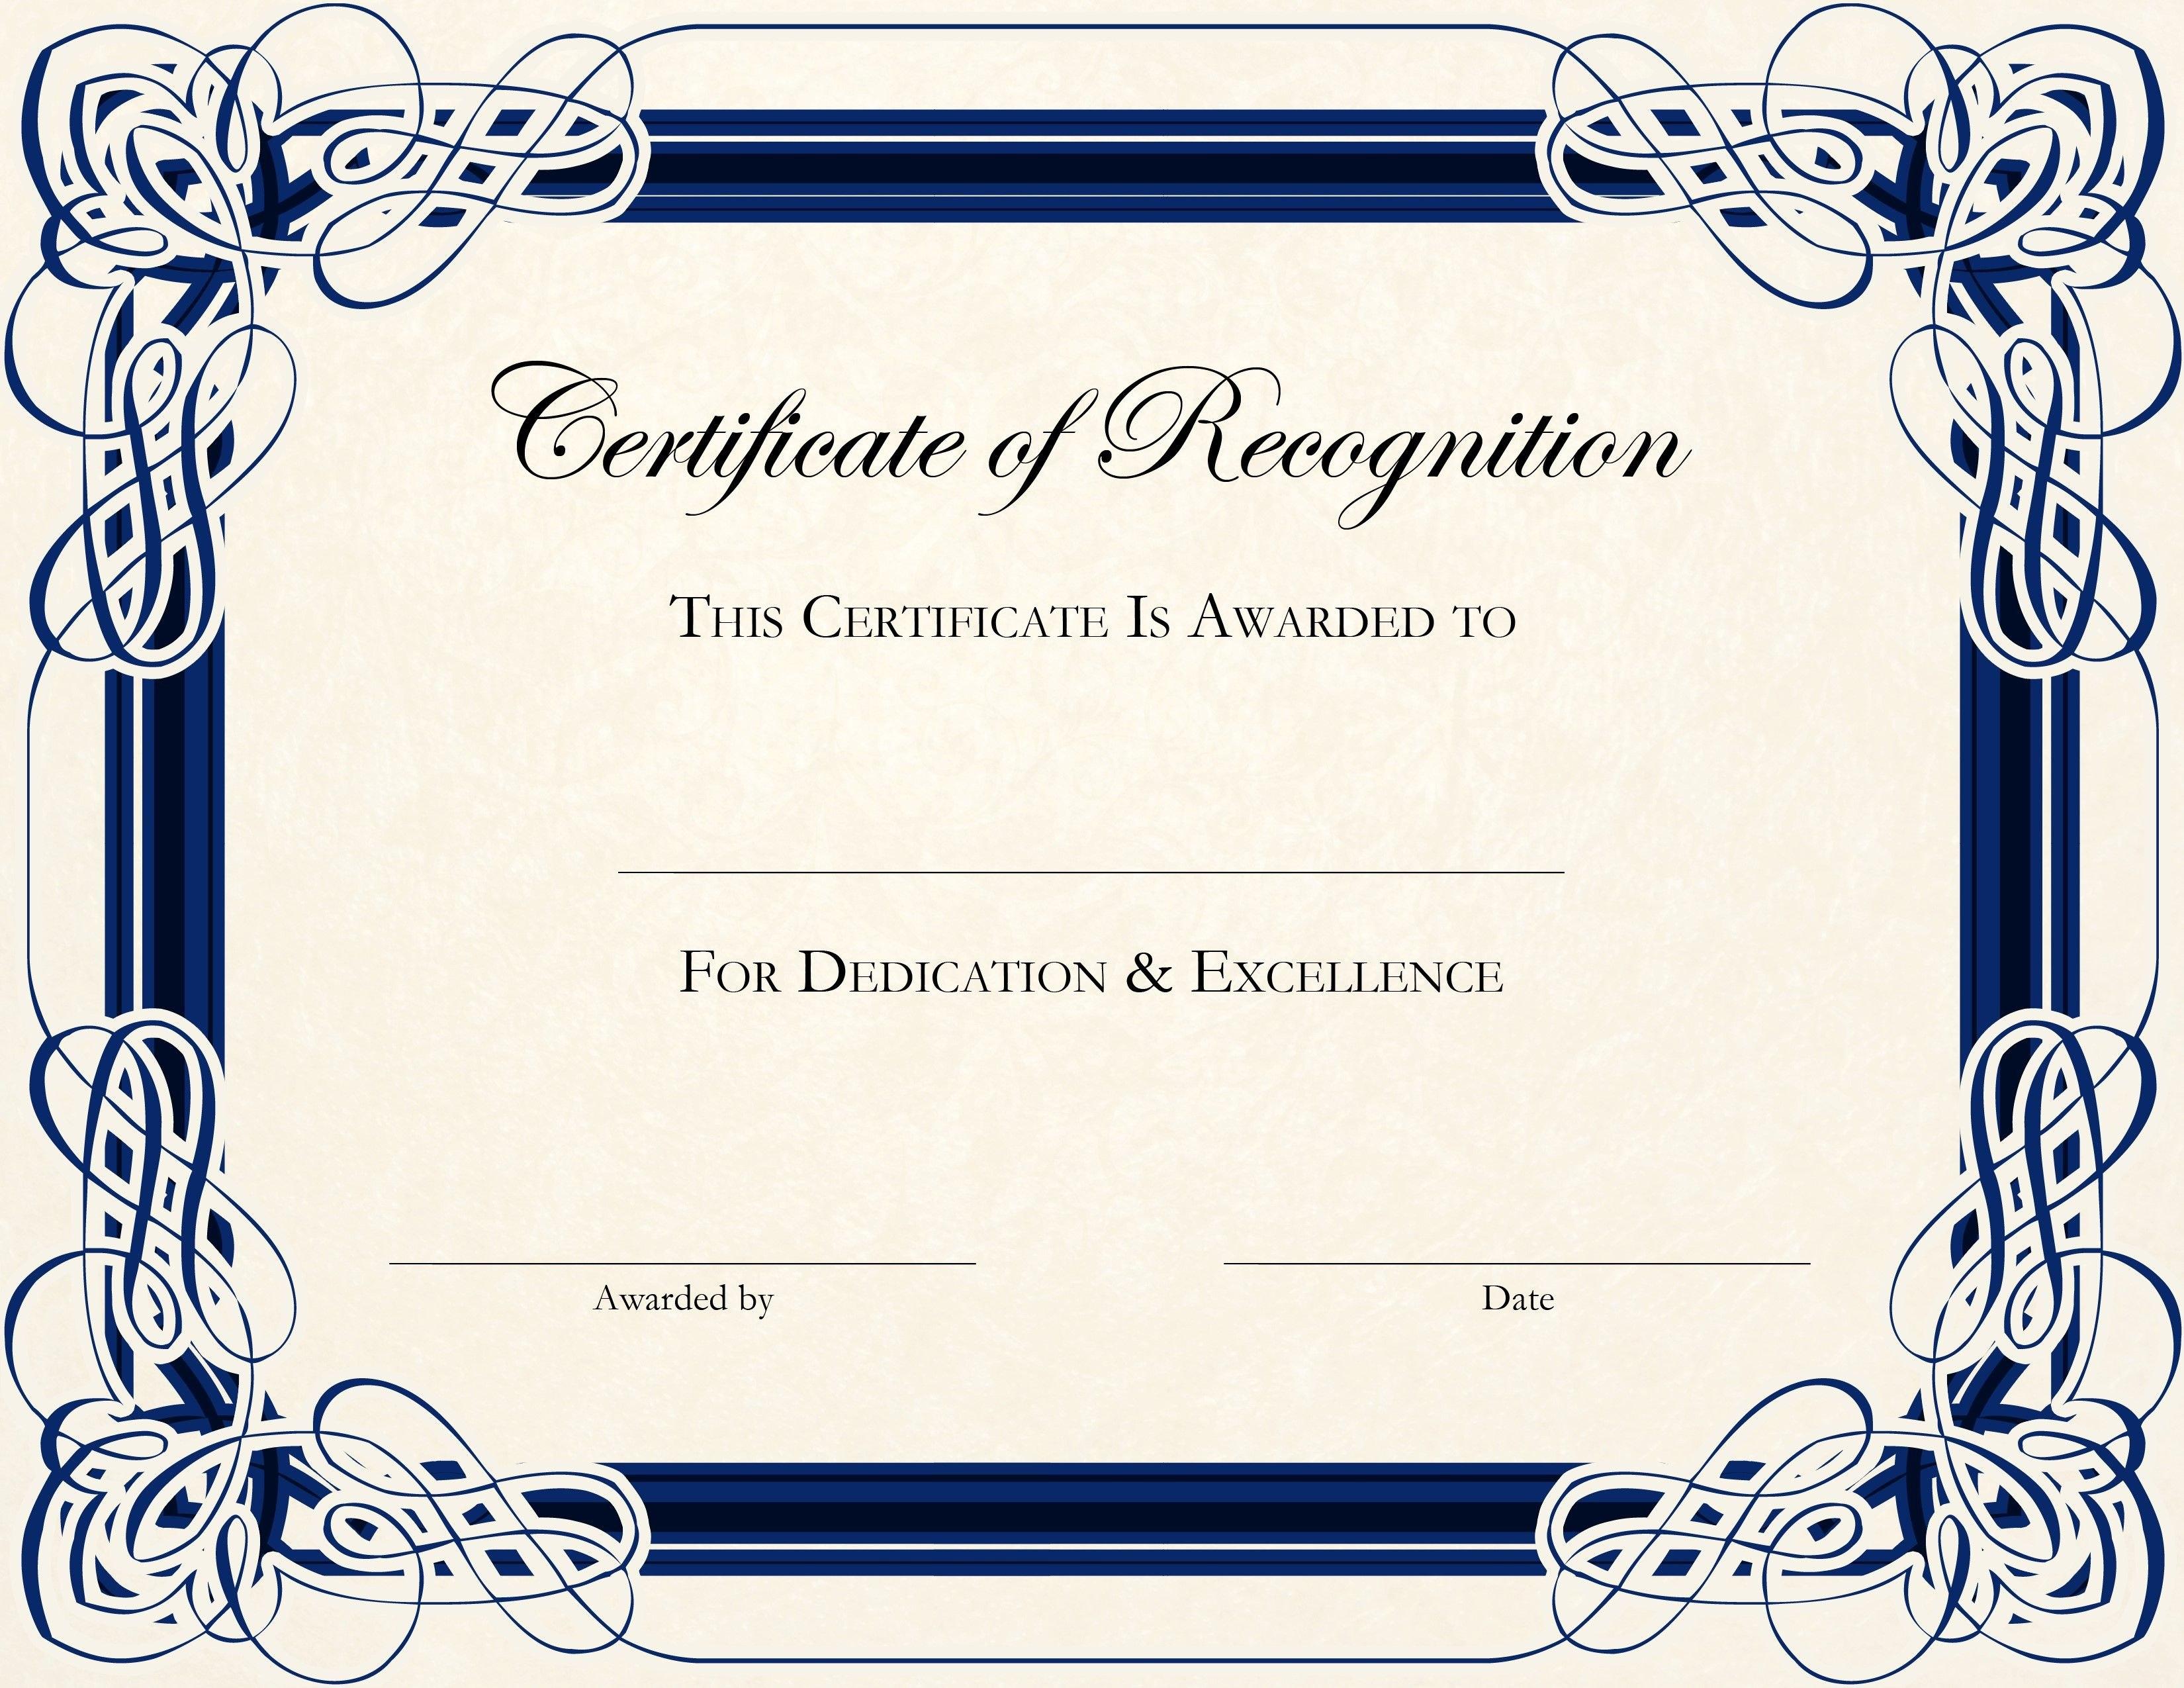 Free Printable Certificate Templates For Teachers  Besttemplate With Regard To Best Teacher Certificate Templates Free